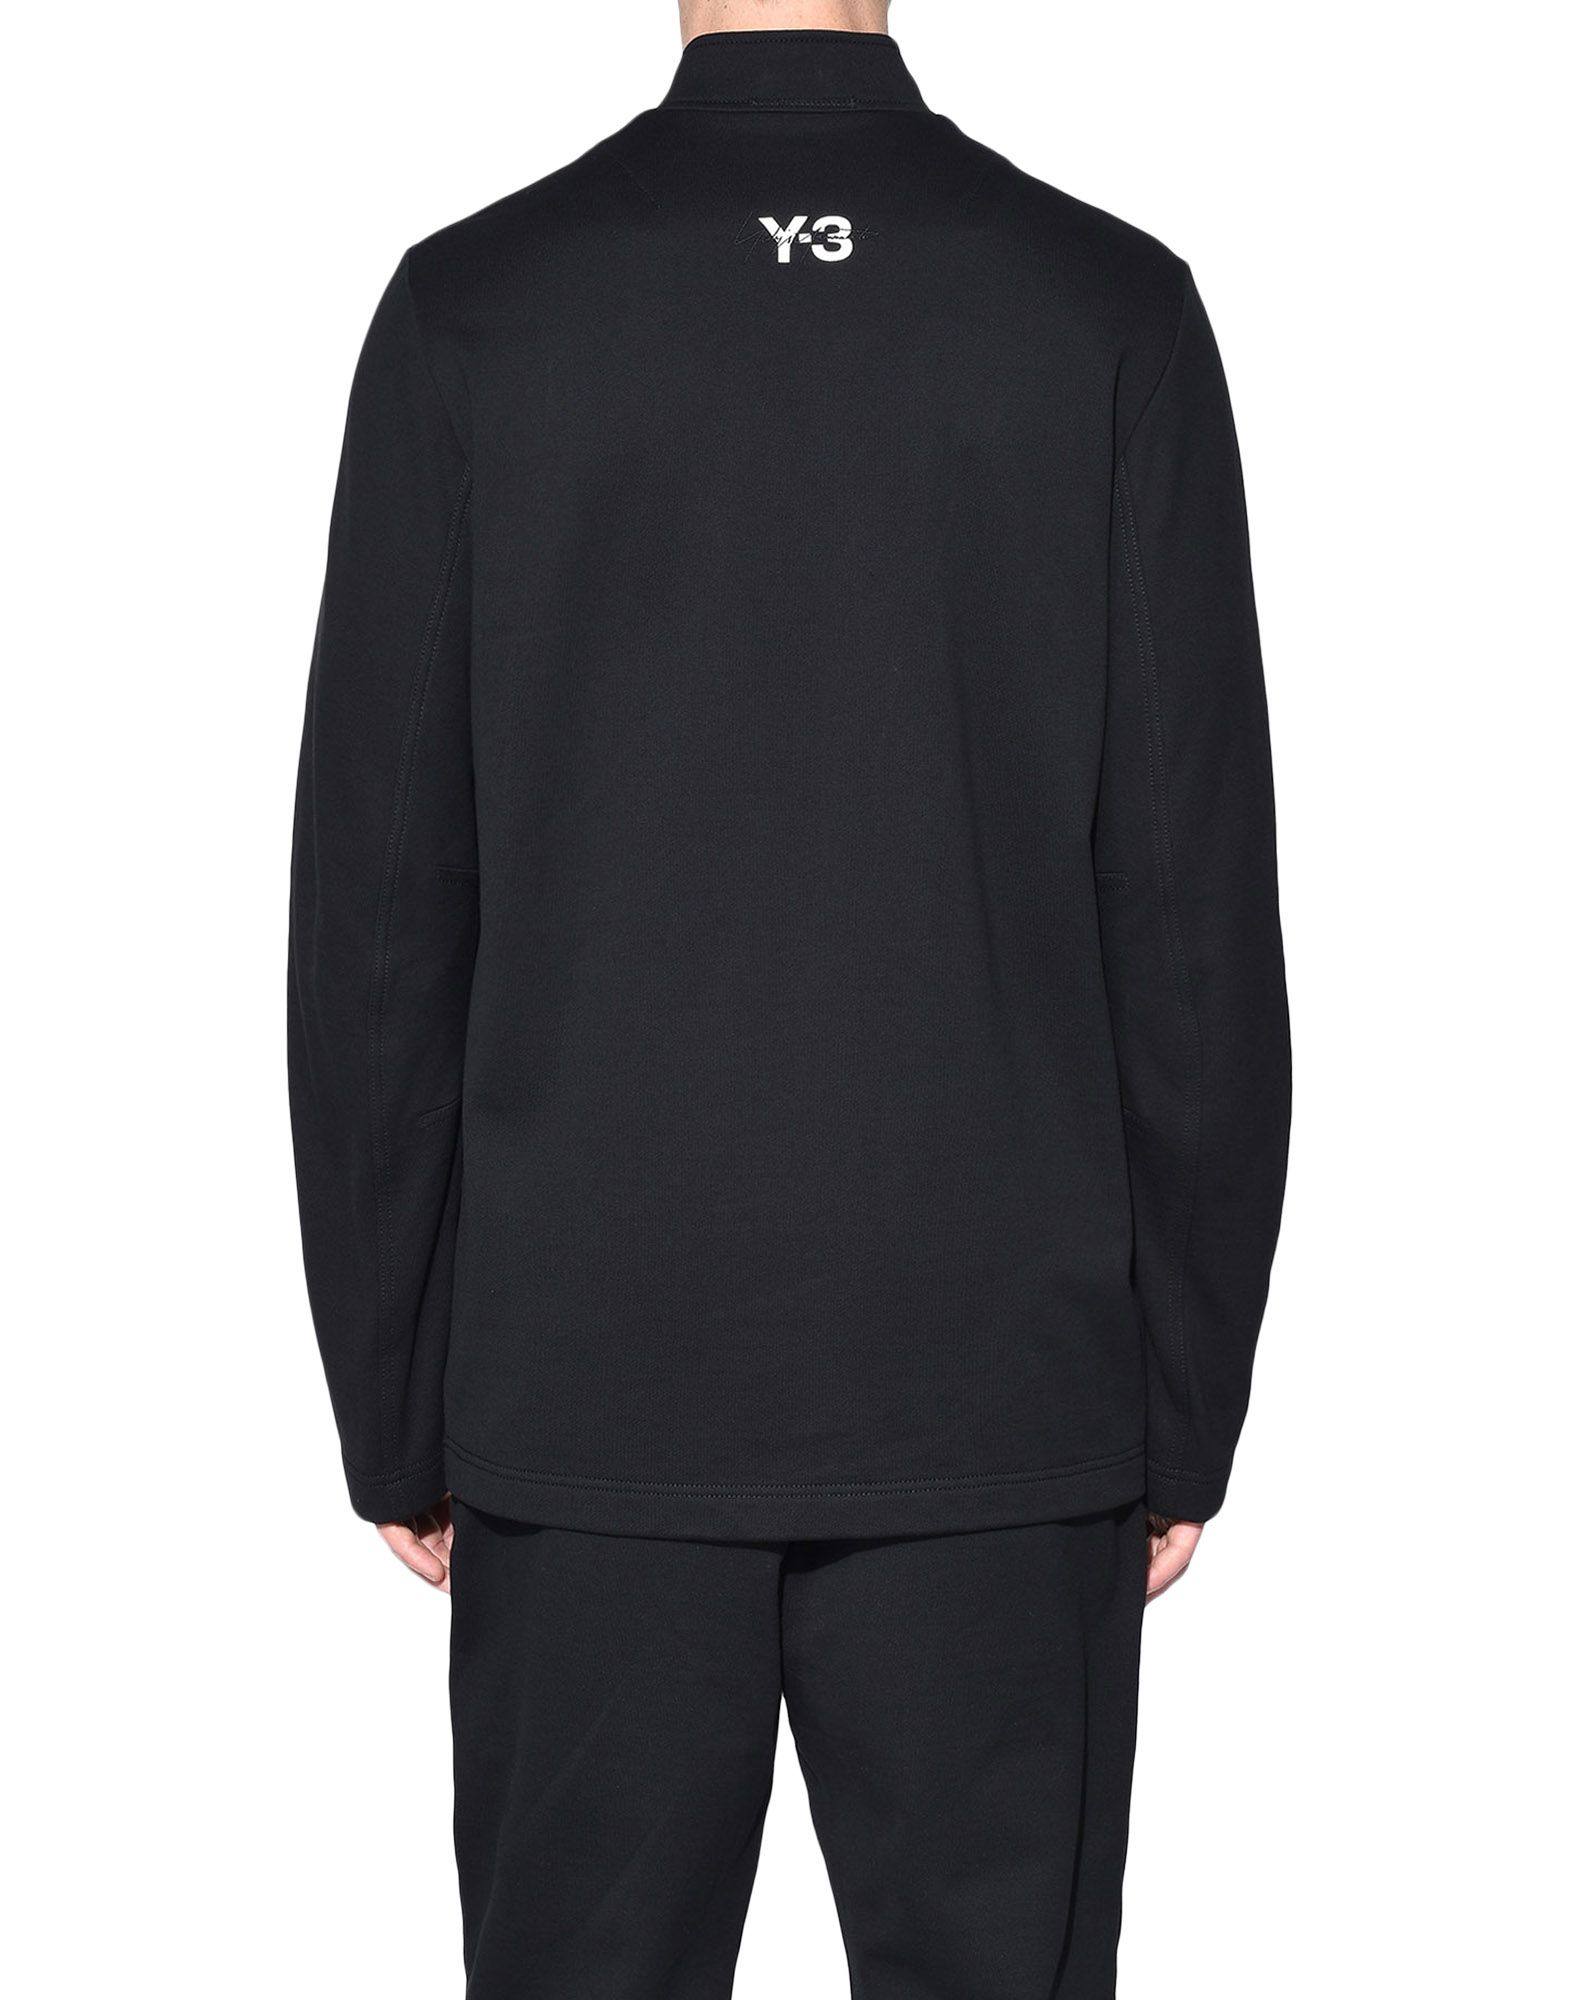 Y-3 Y-3 Sashiko Sweater Zipped jumper Man d